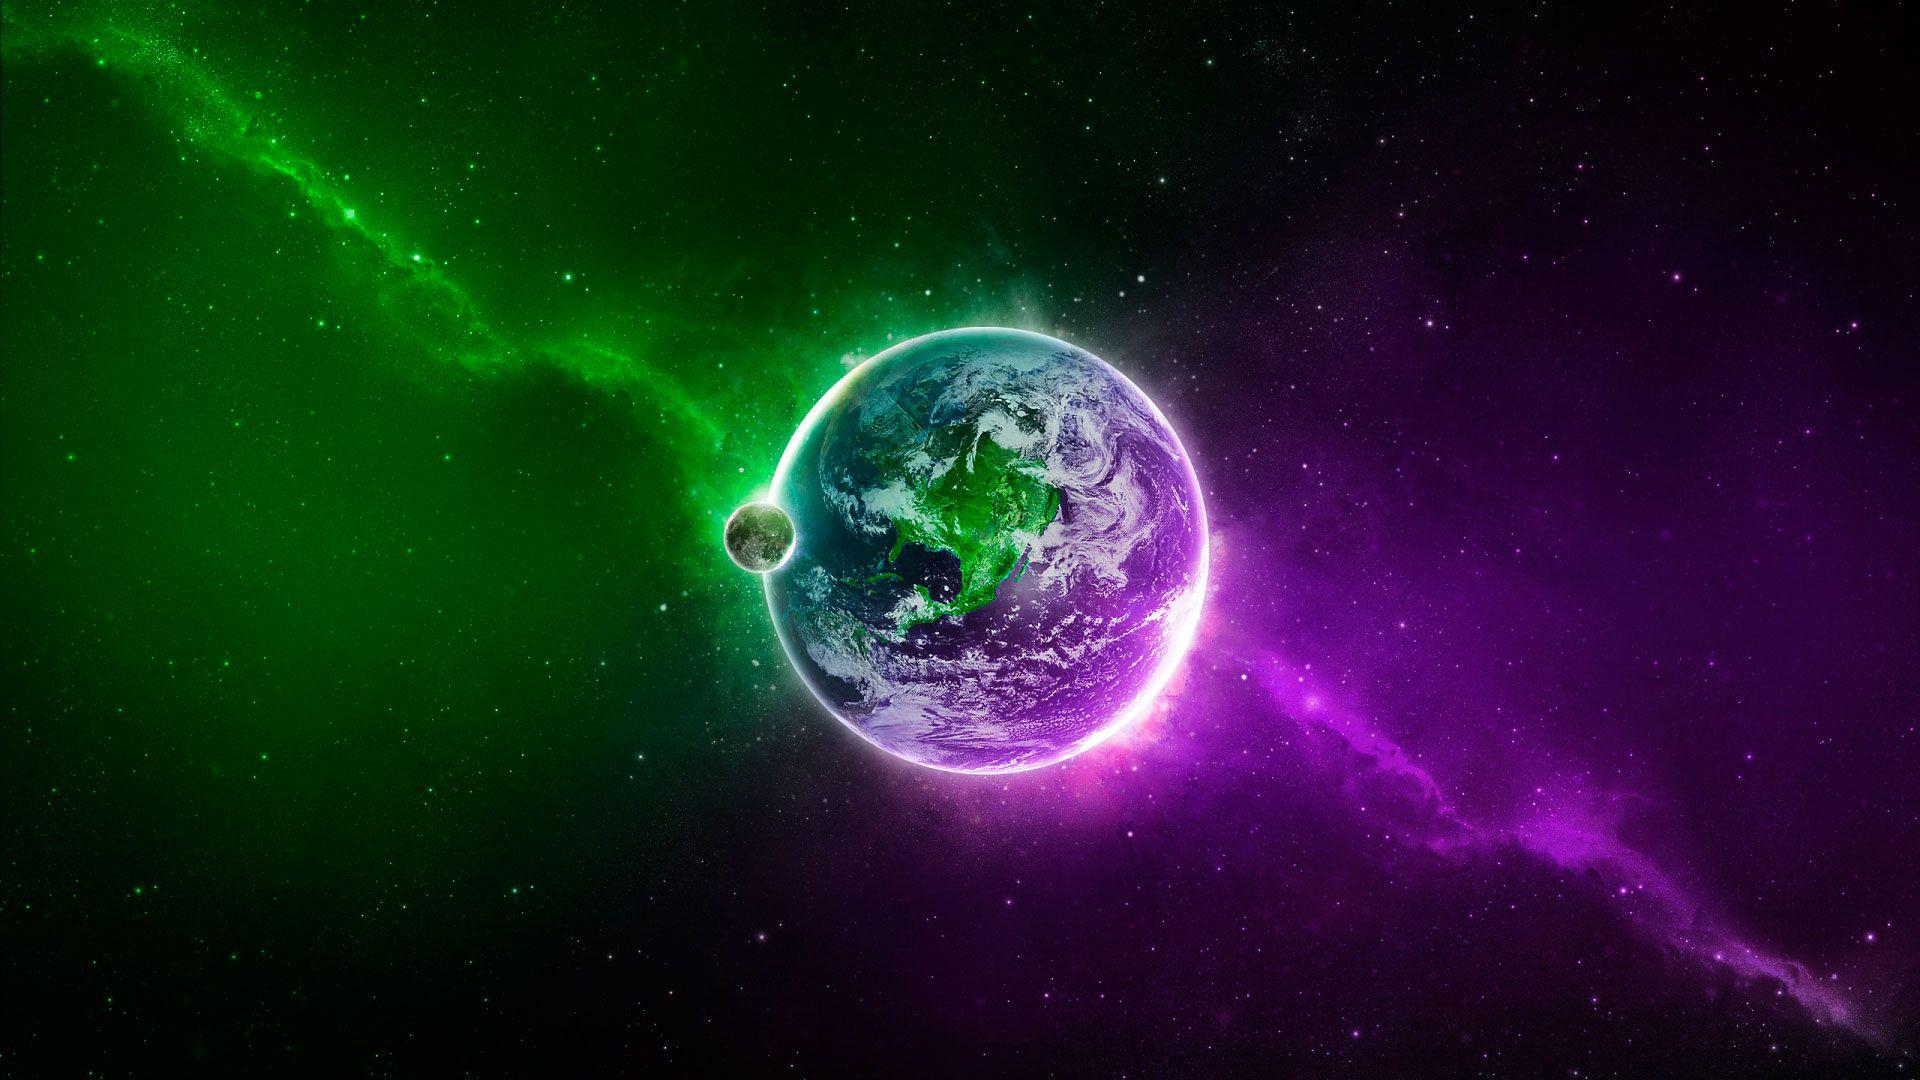 Green And Purple HD Wallpaper